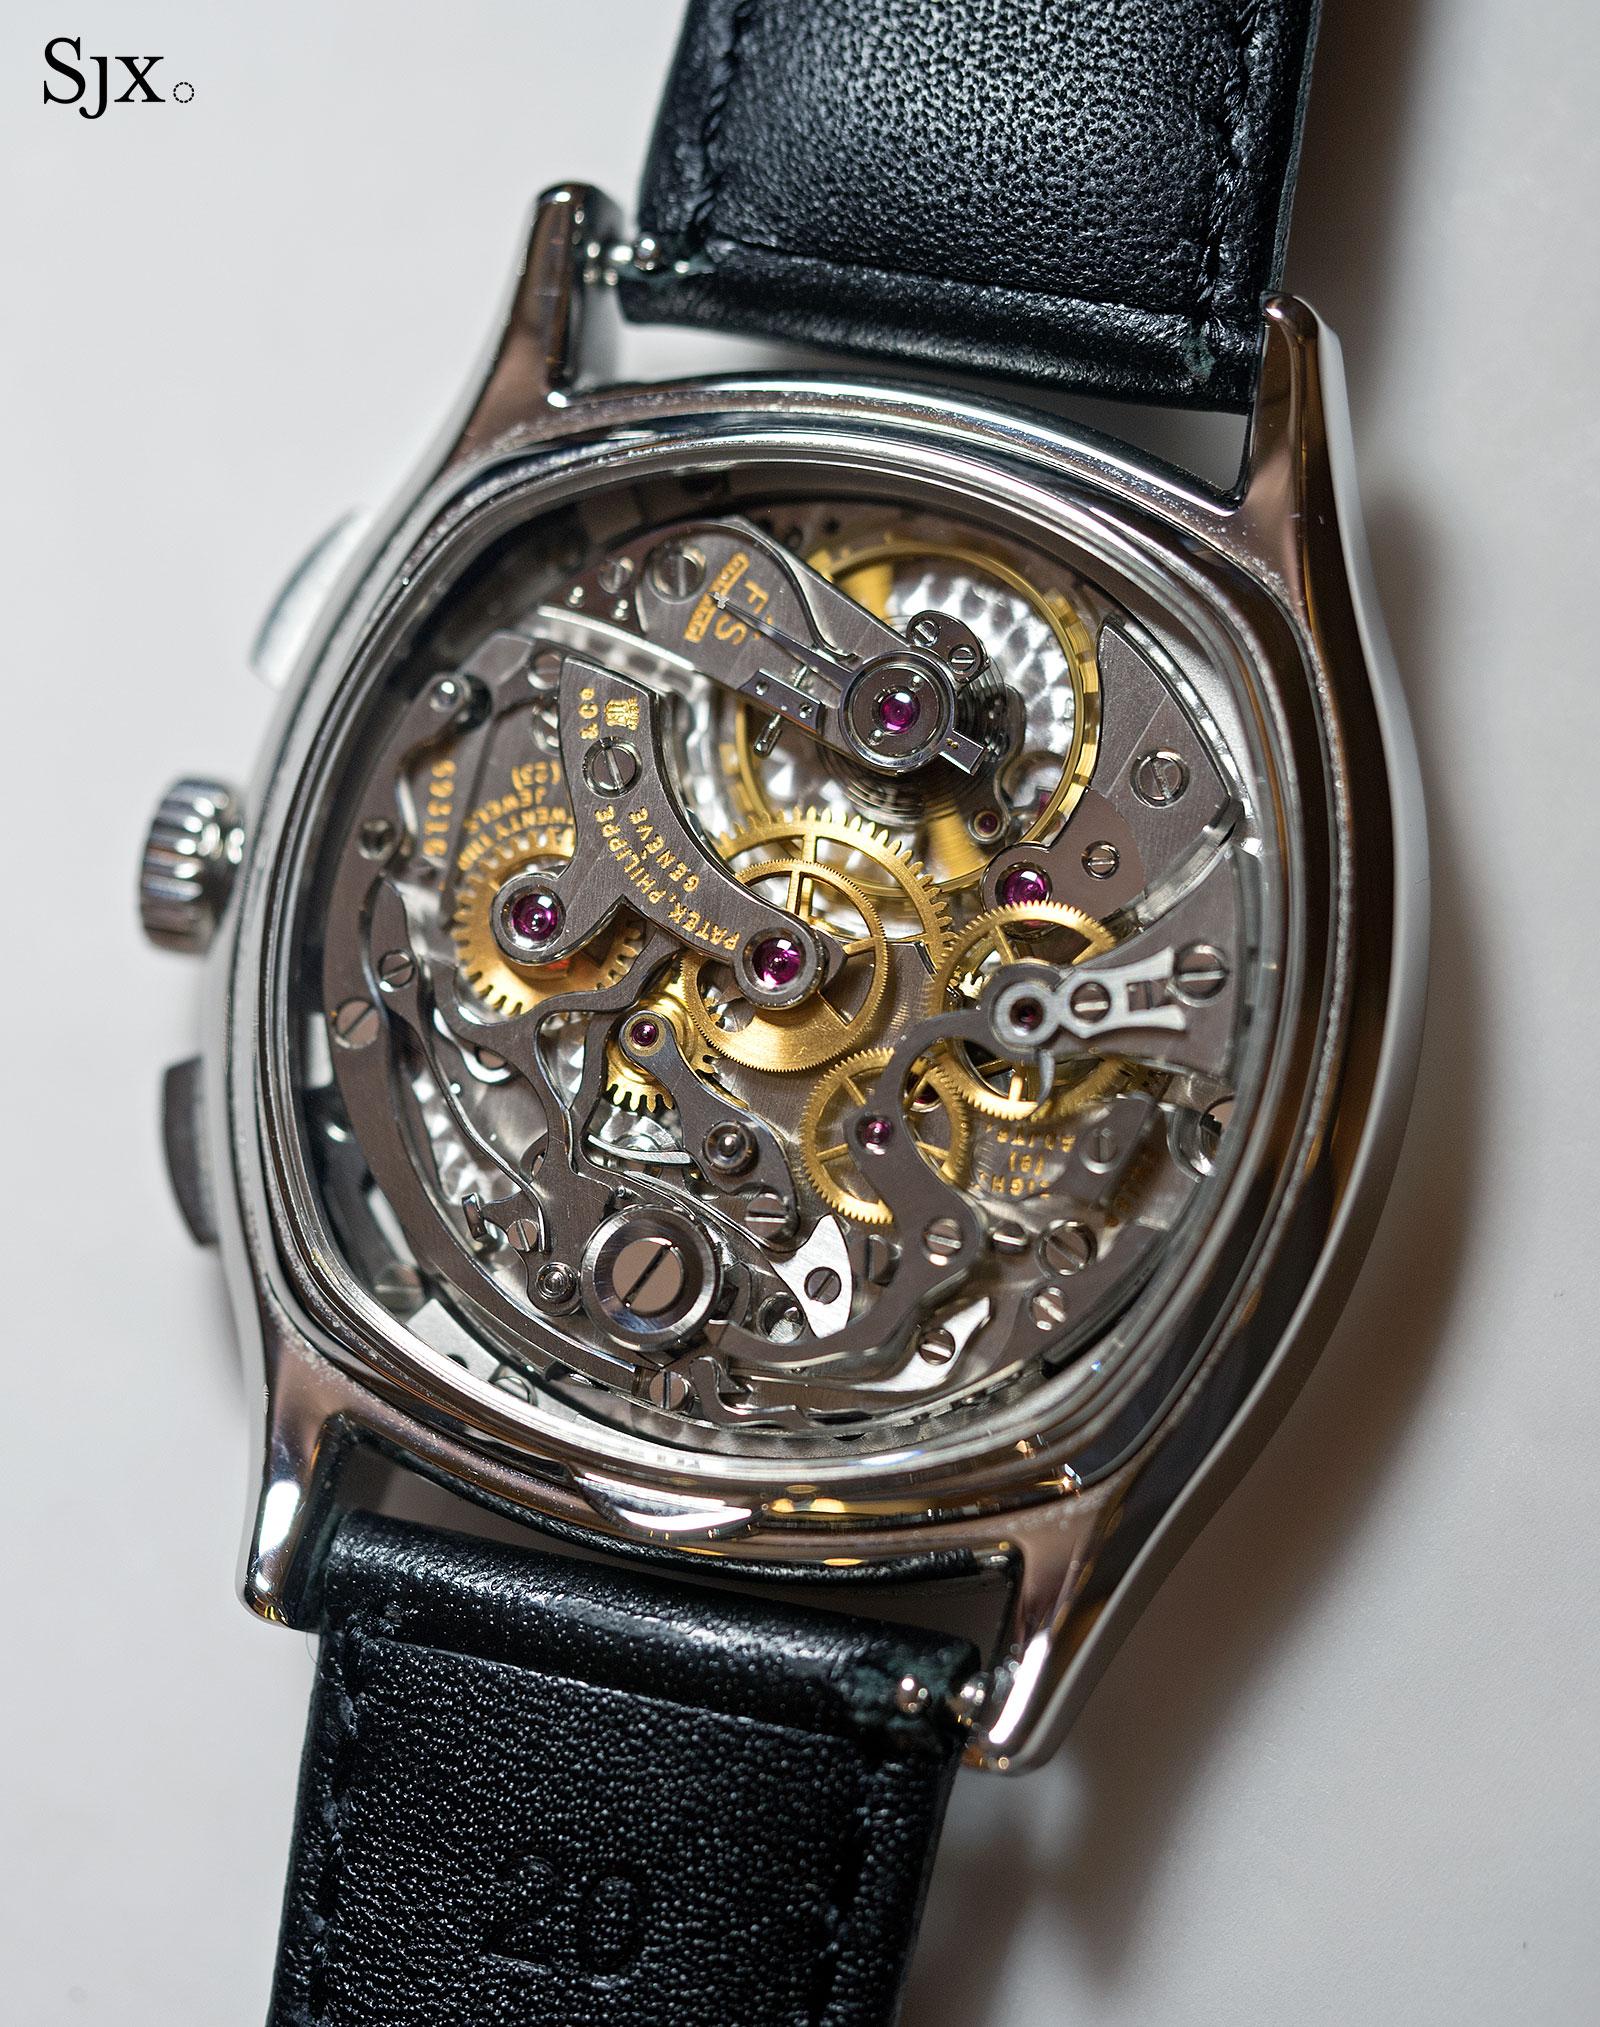 Patek Philippe 3670 chronograph steel 4